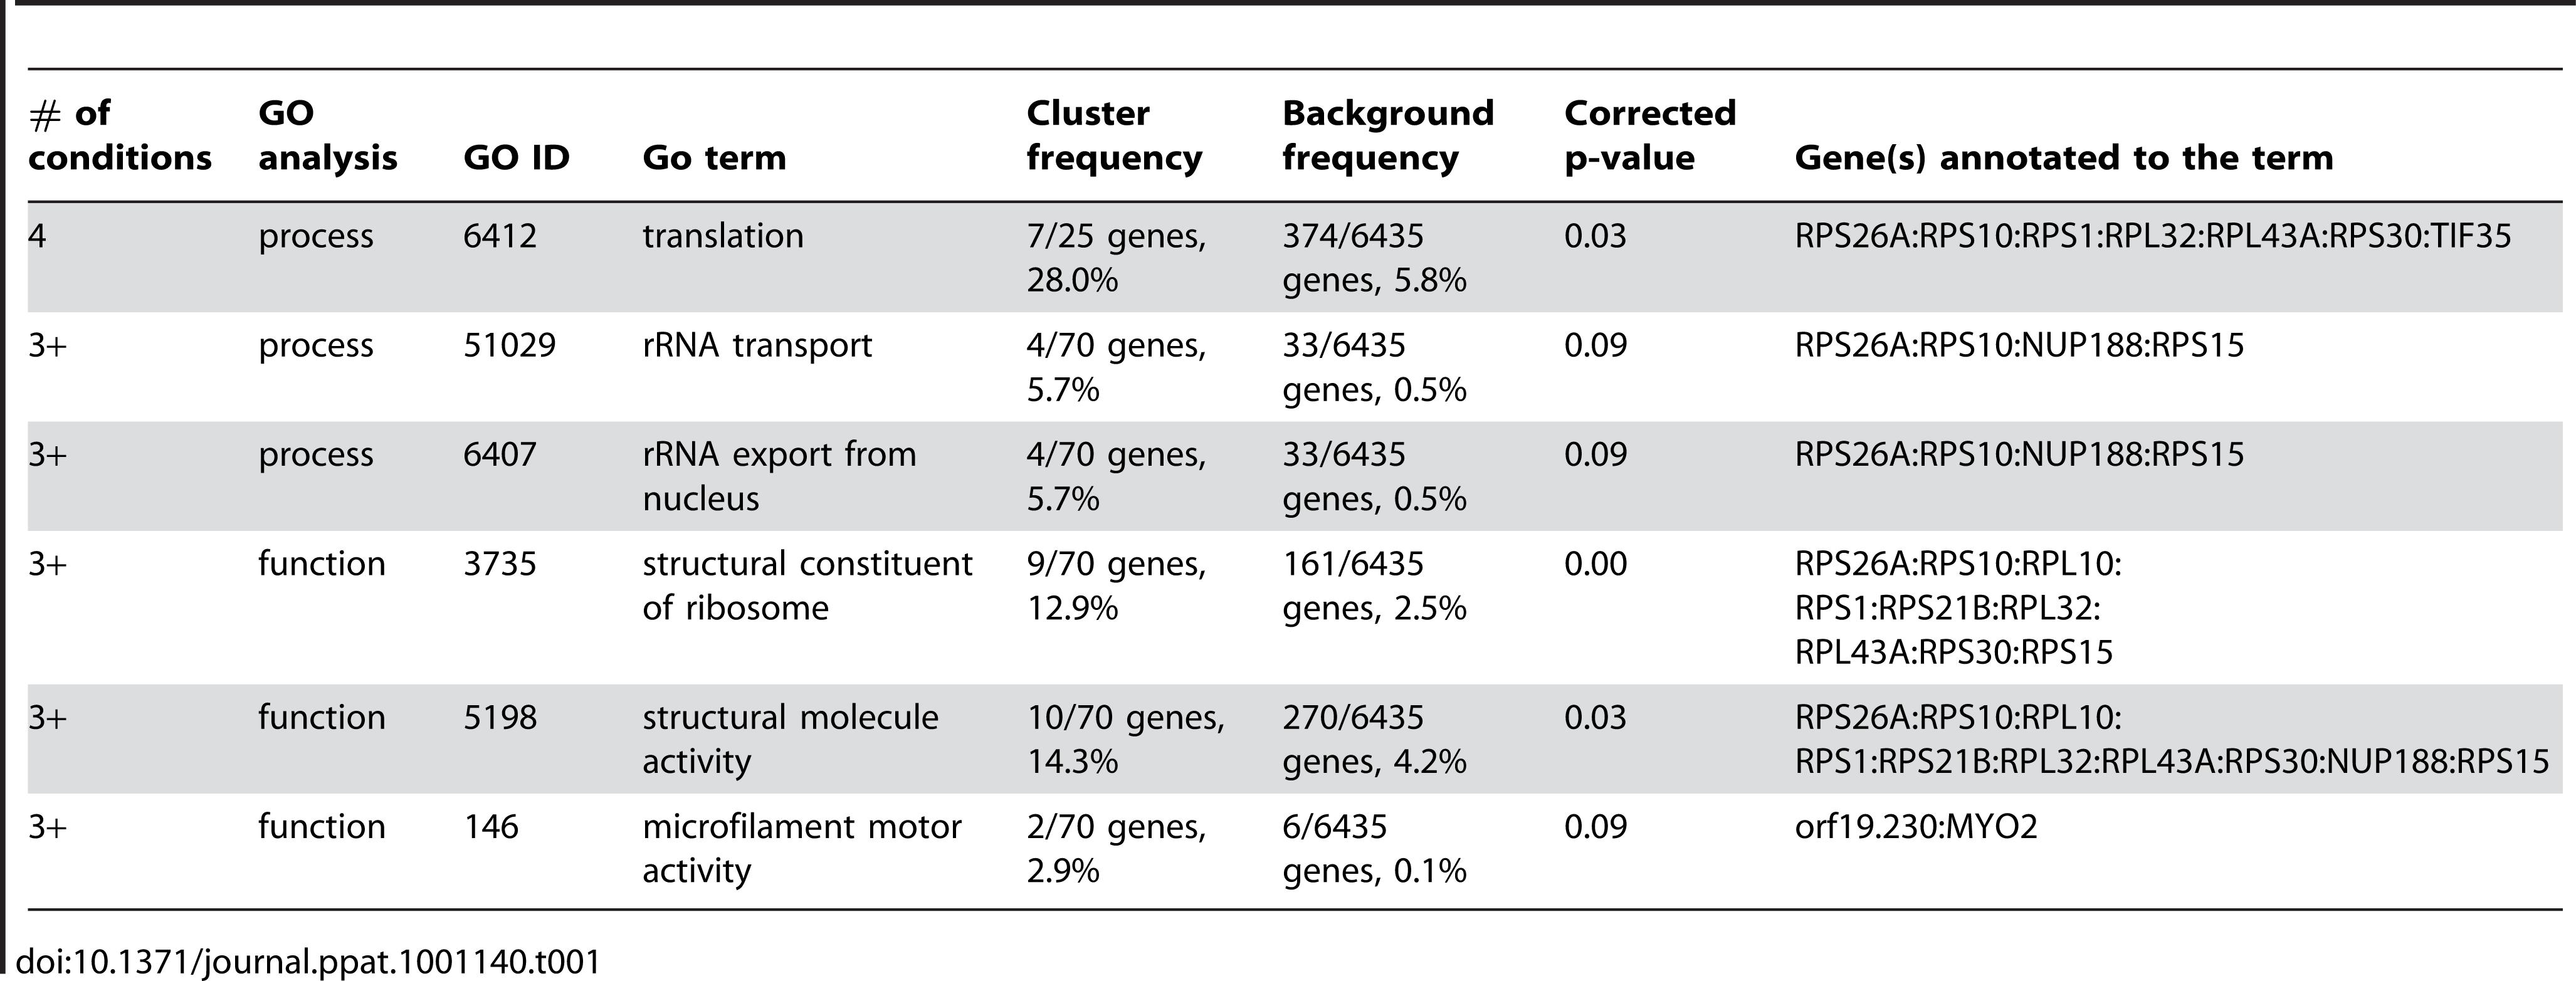 GO analysis of genes haploinsufficient in 3 or more media types.